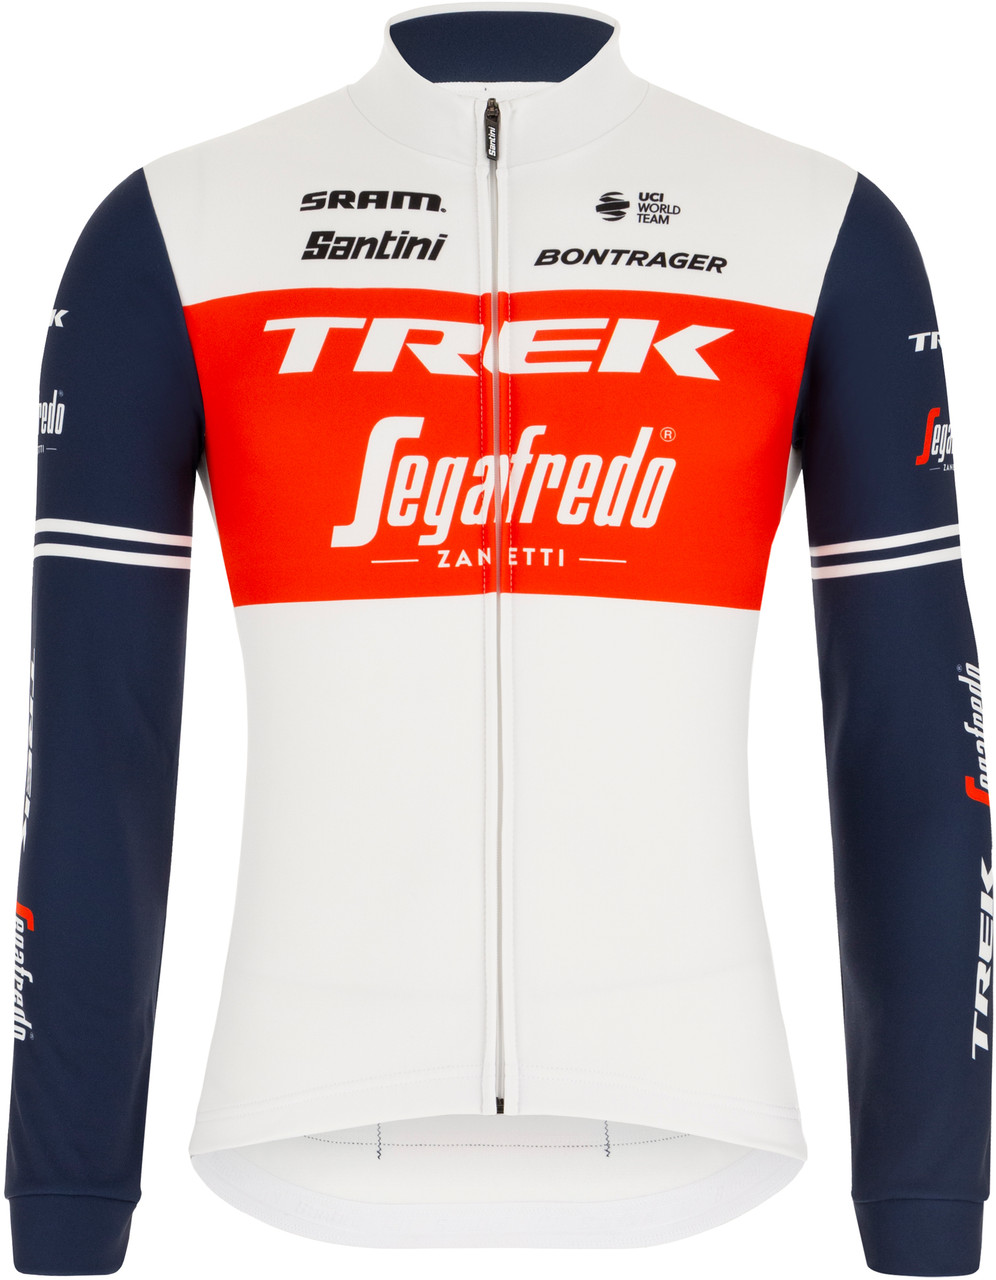 2021 Trek Segafredo Long Sleeve Jersey